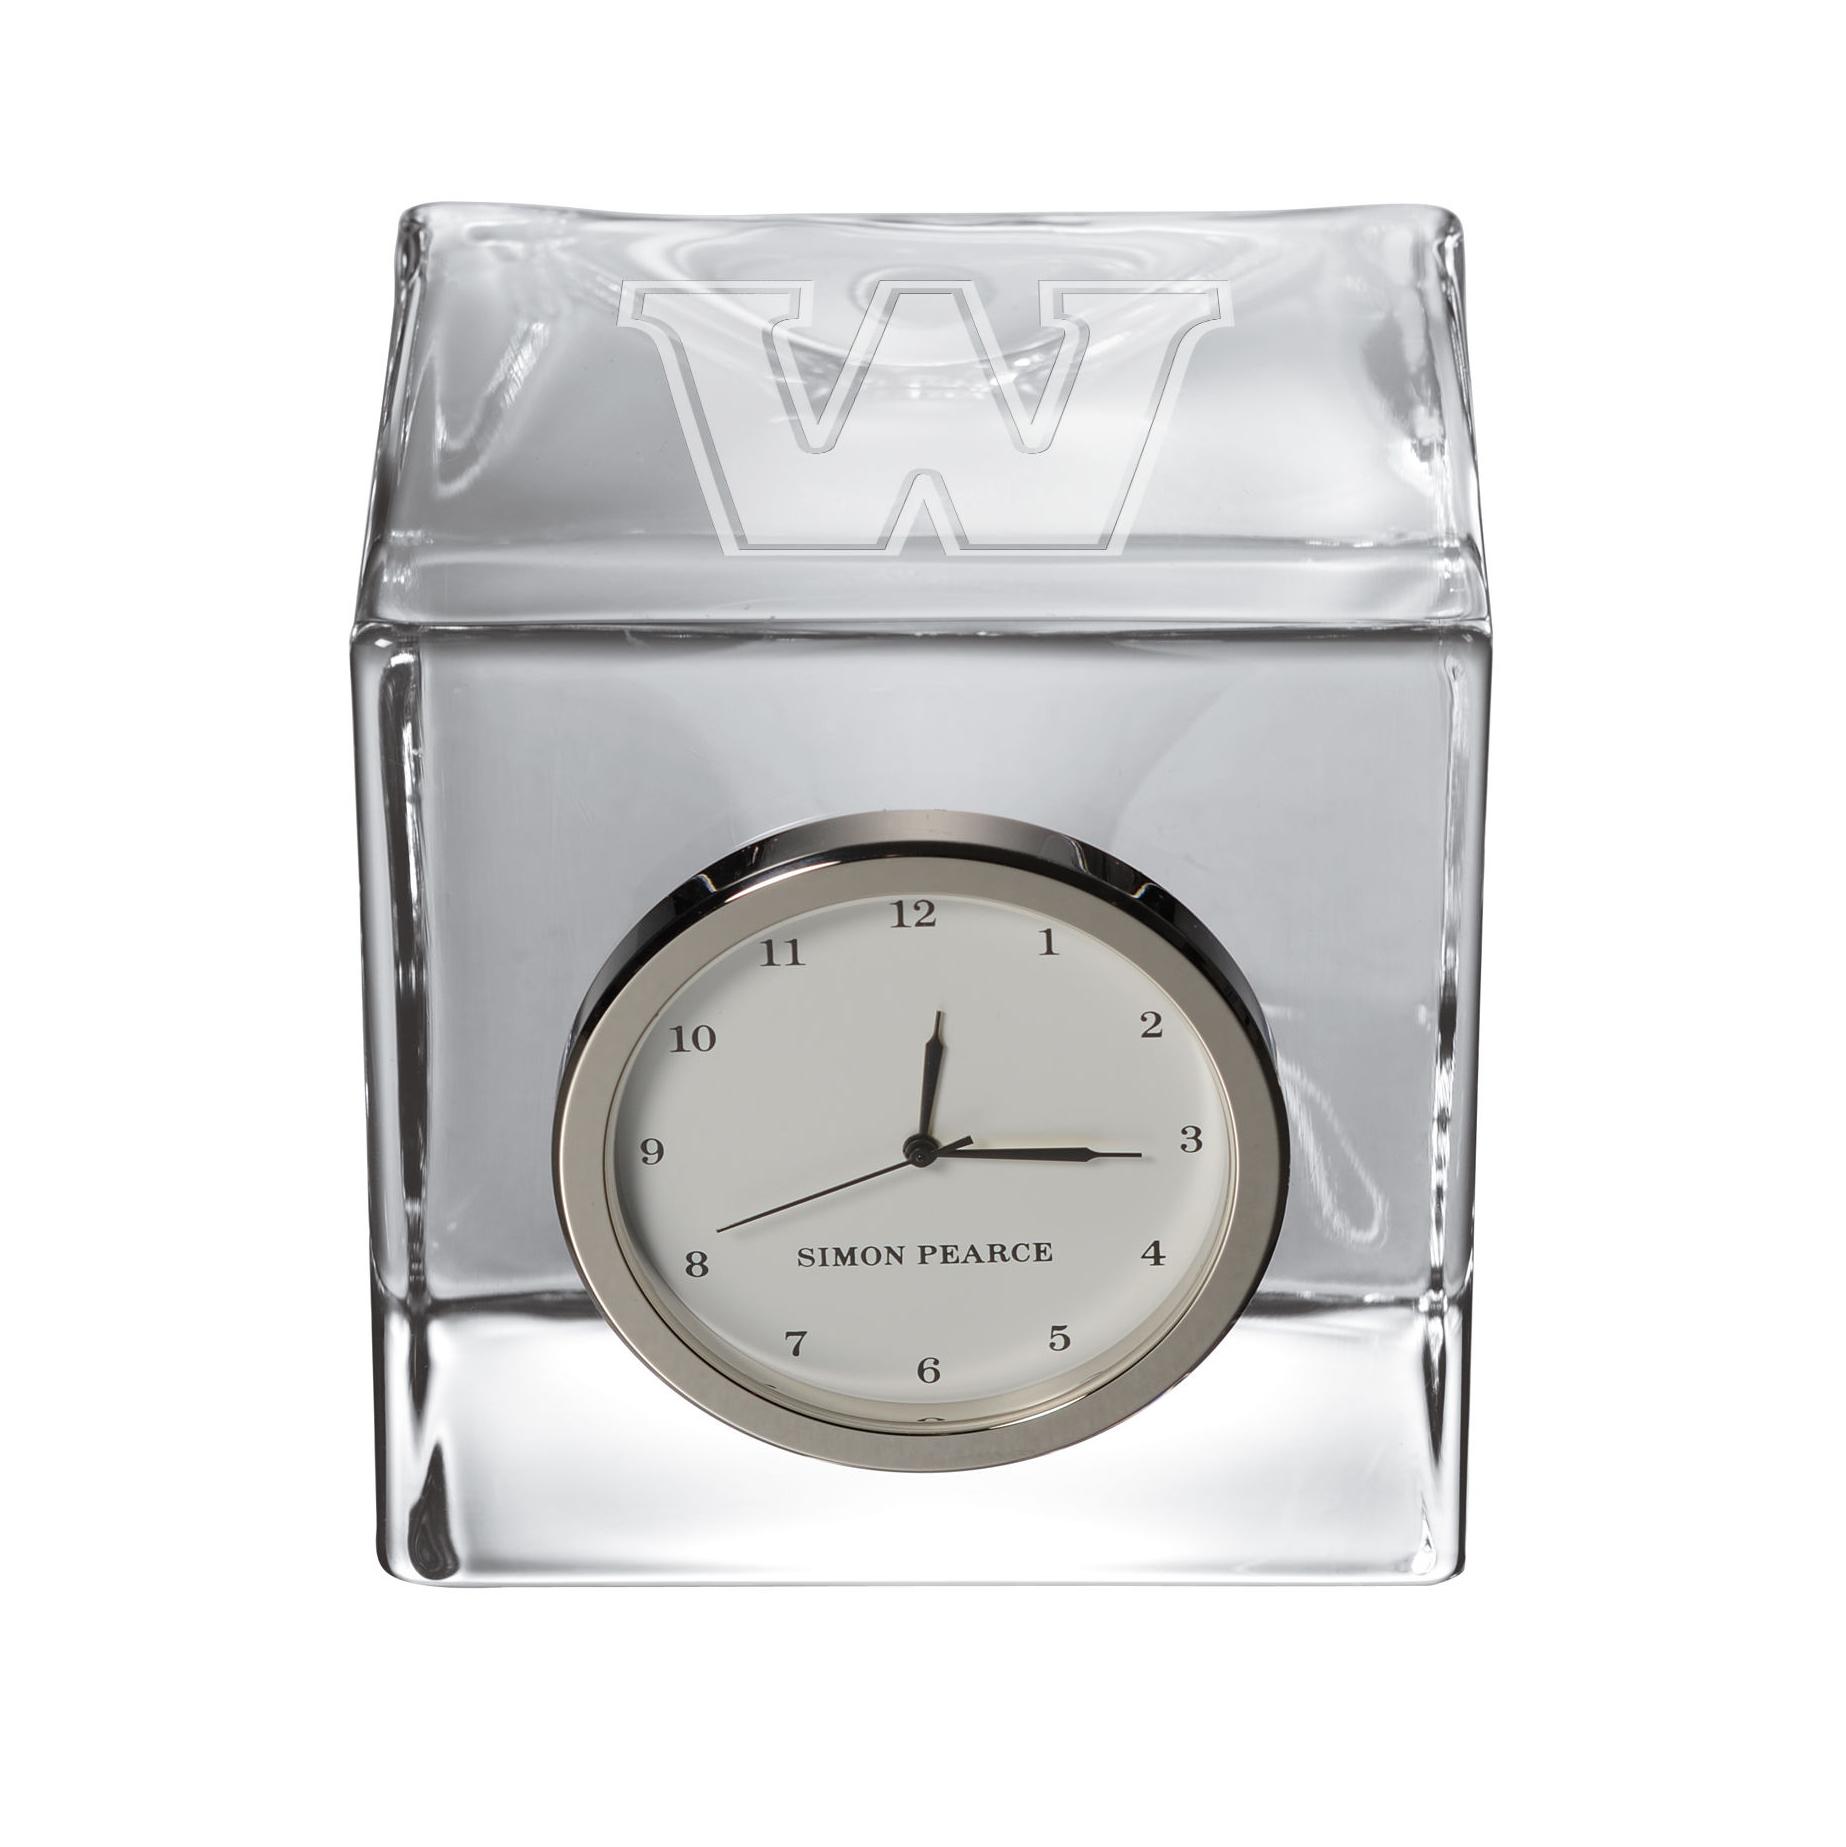 Williams Glass Desk Clock by Simon Pearce